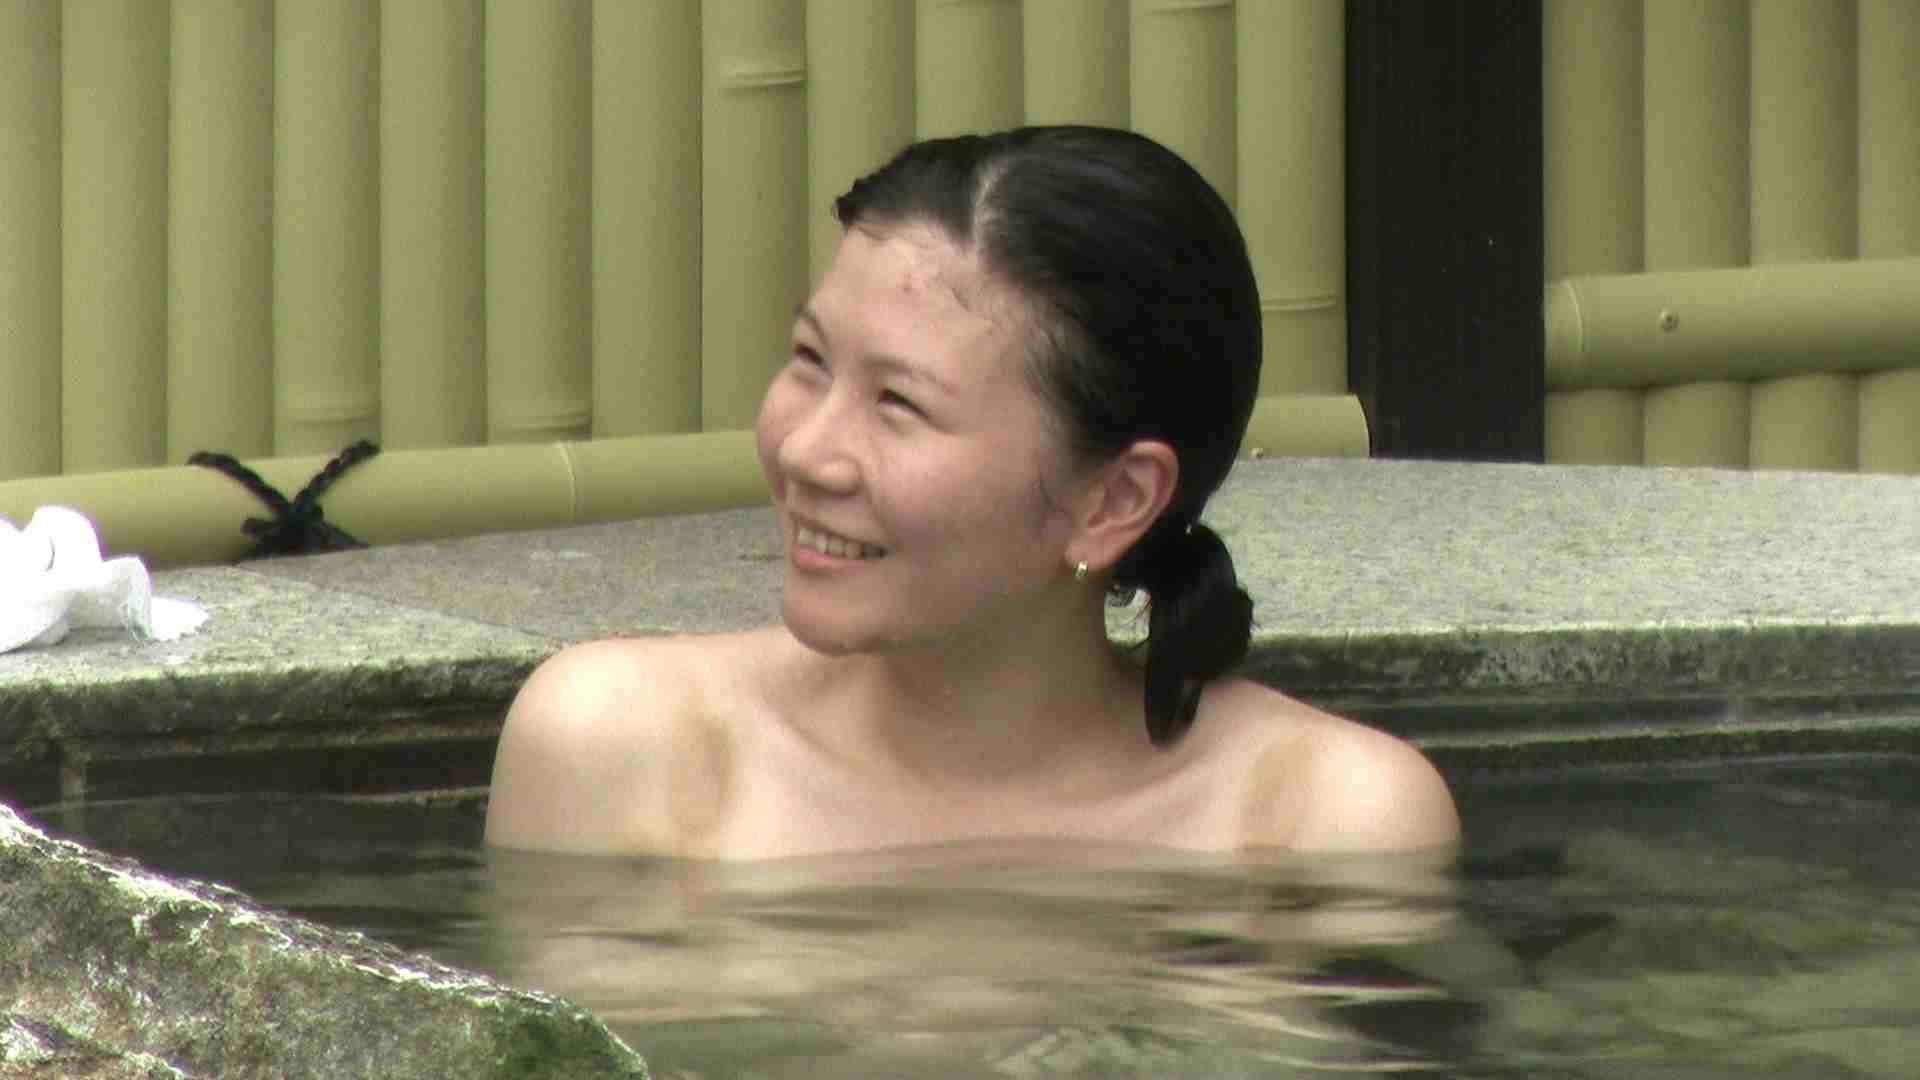 Aquaな露天風呂Vol.187 盗撮   HなOL  96pic 38